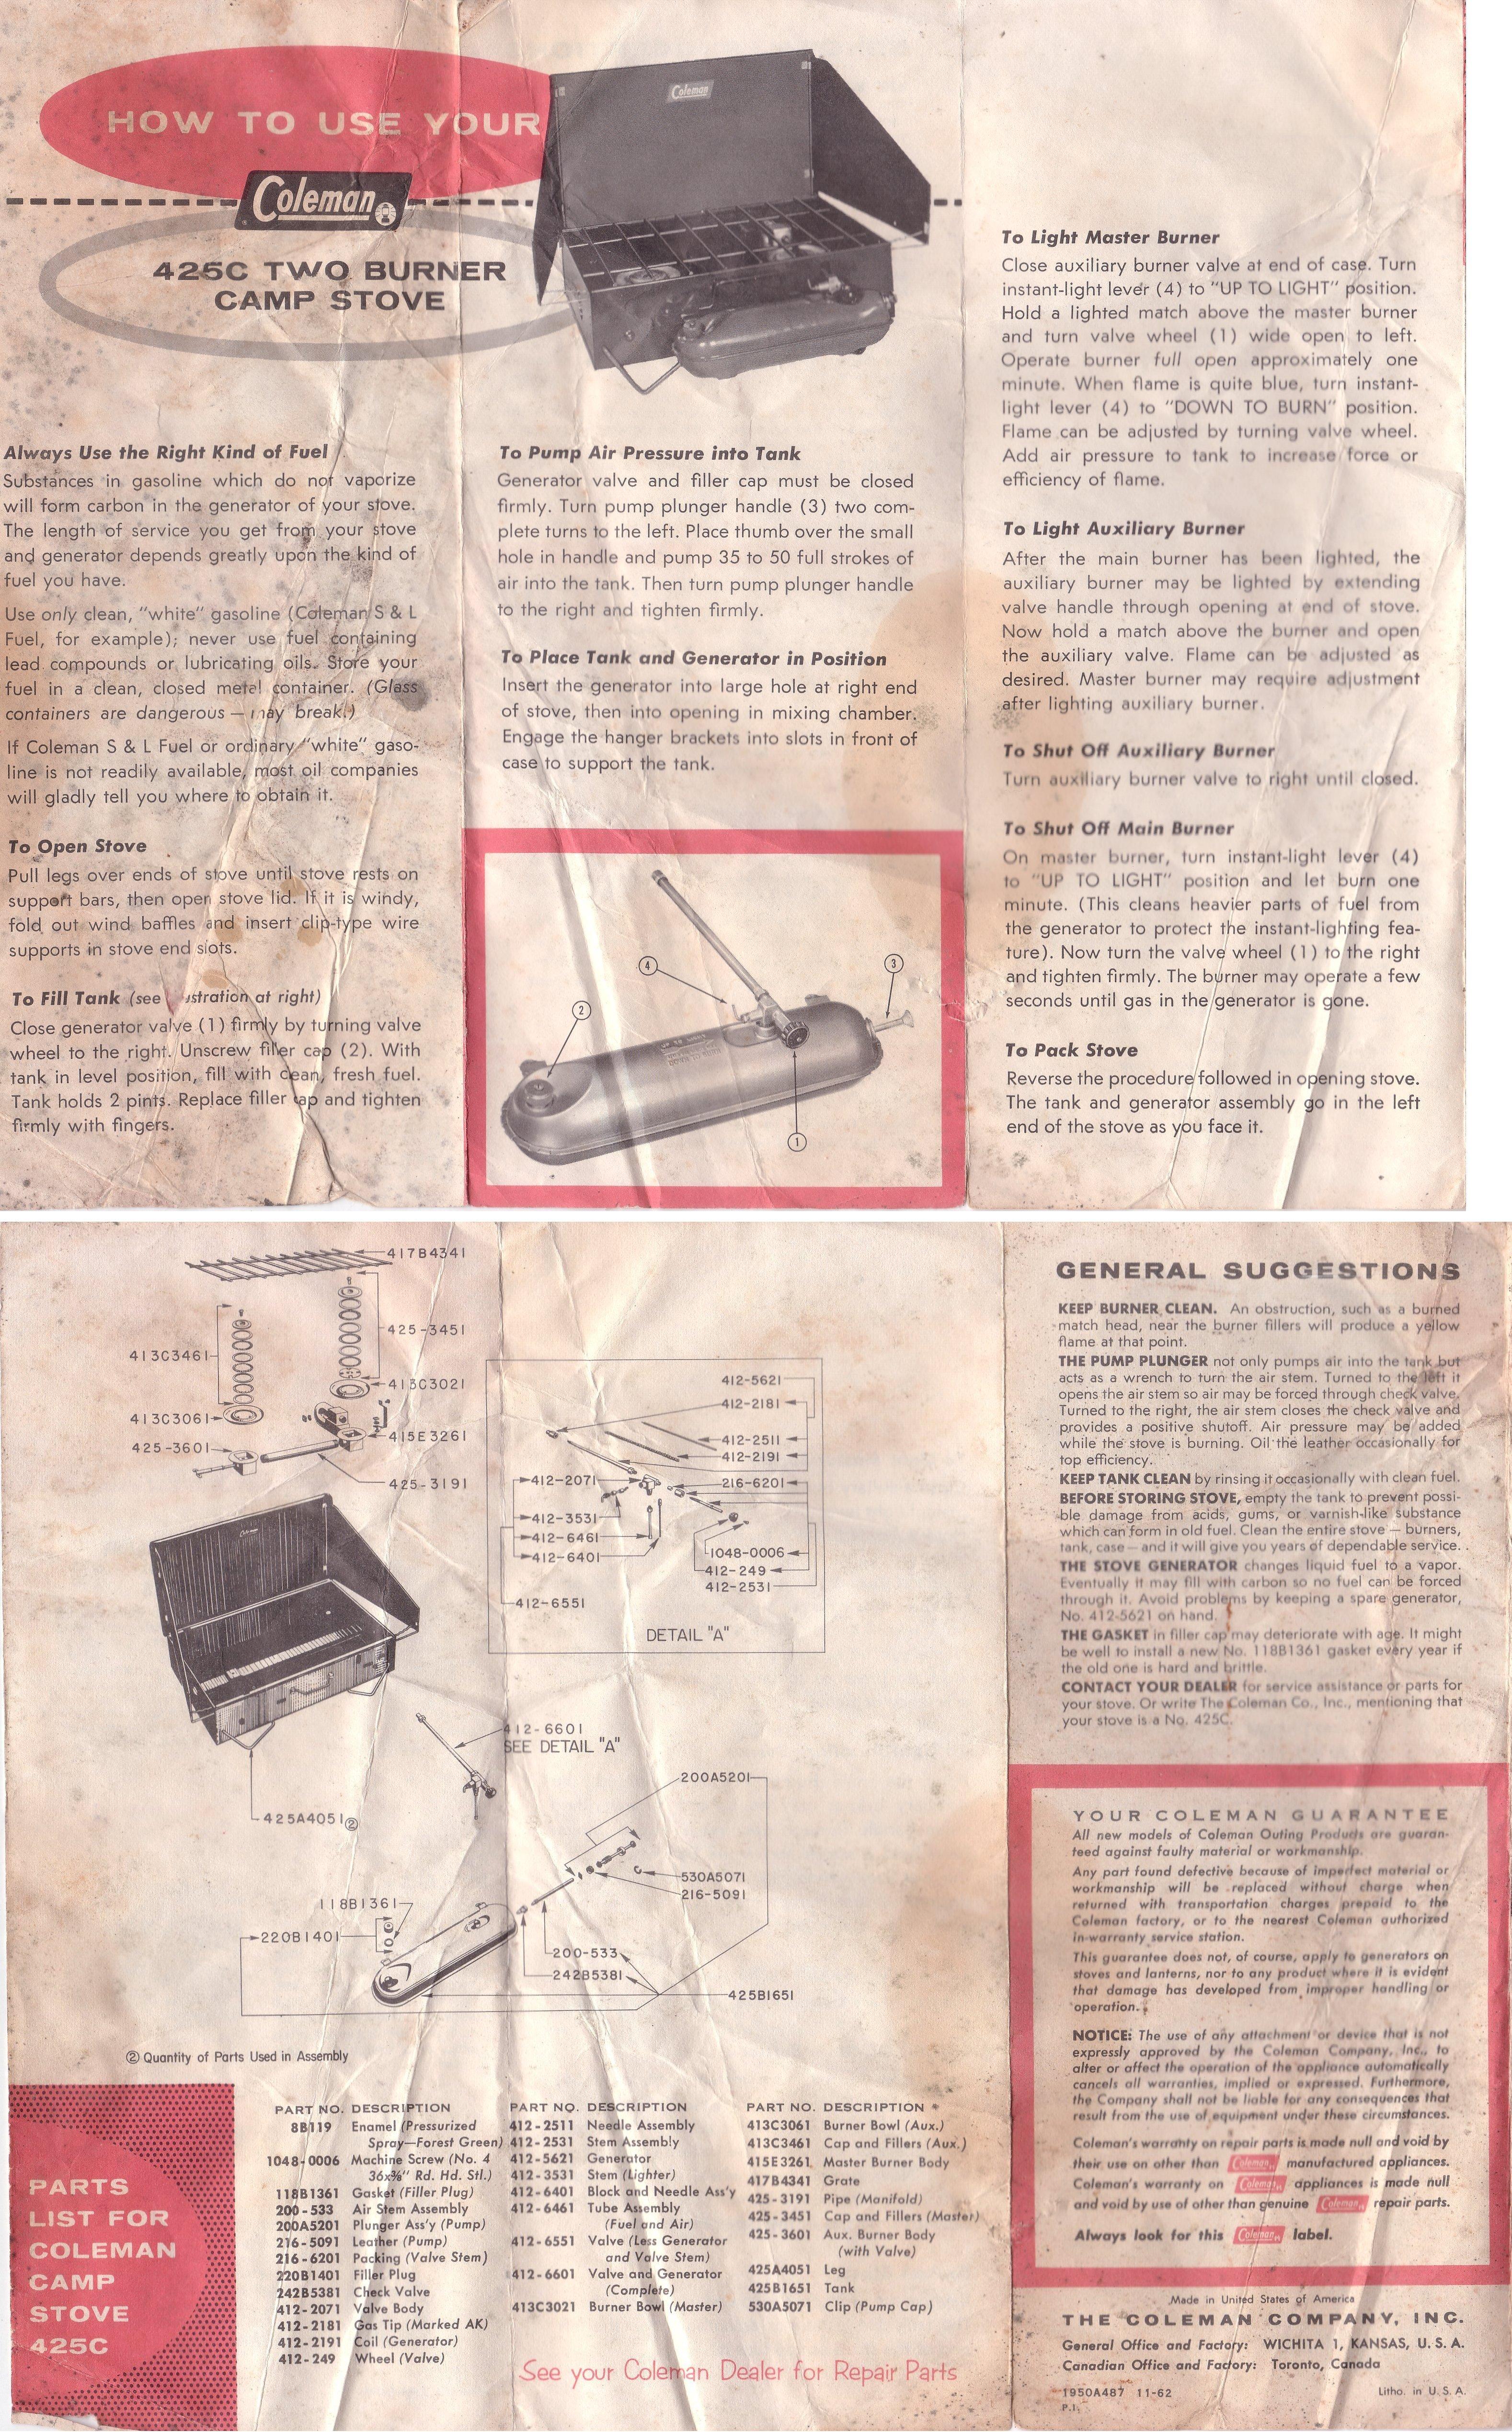 ... 2011-06-07 20:50 3.2M [ ] Compaq Presario V2000 Service Manual.pdf ...